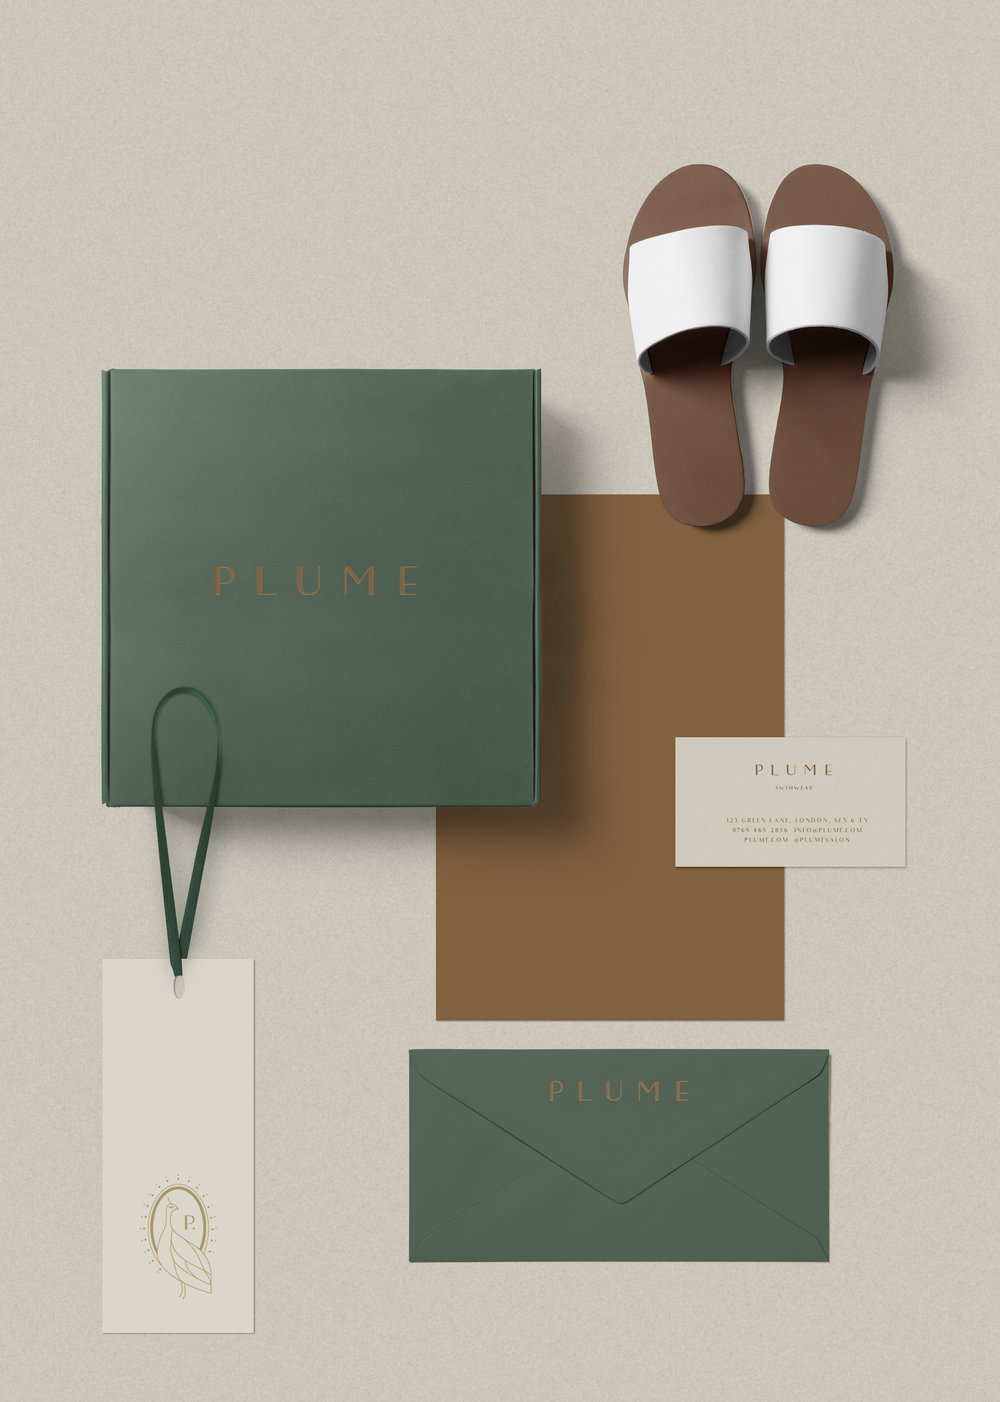 plume-logo-branding-design-loolaadesigns.jpg